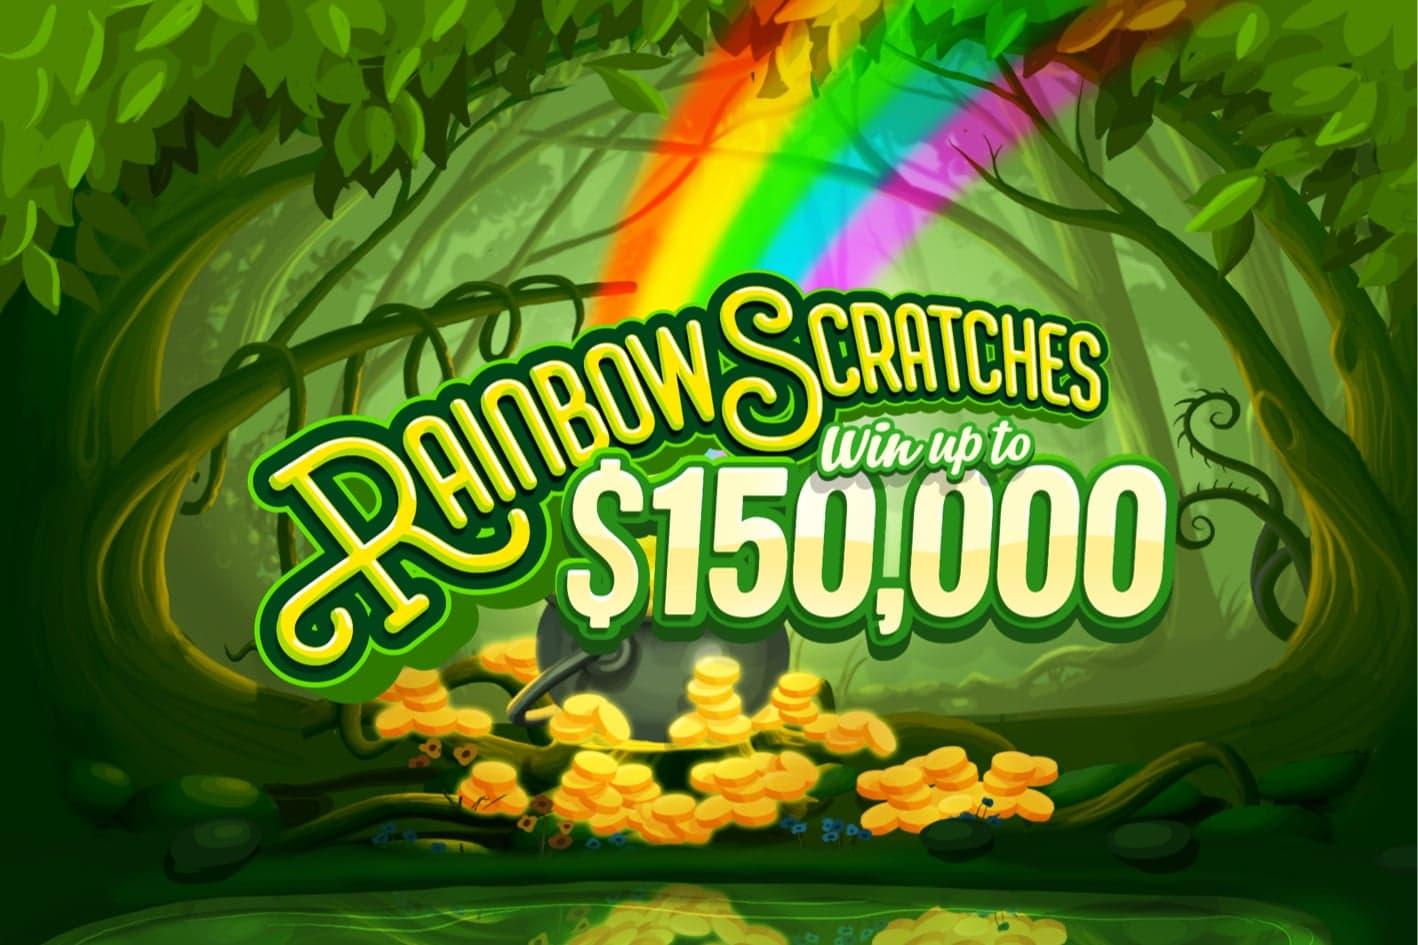 RainbowScratches